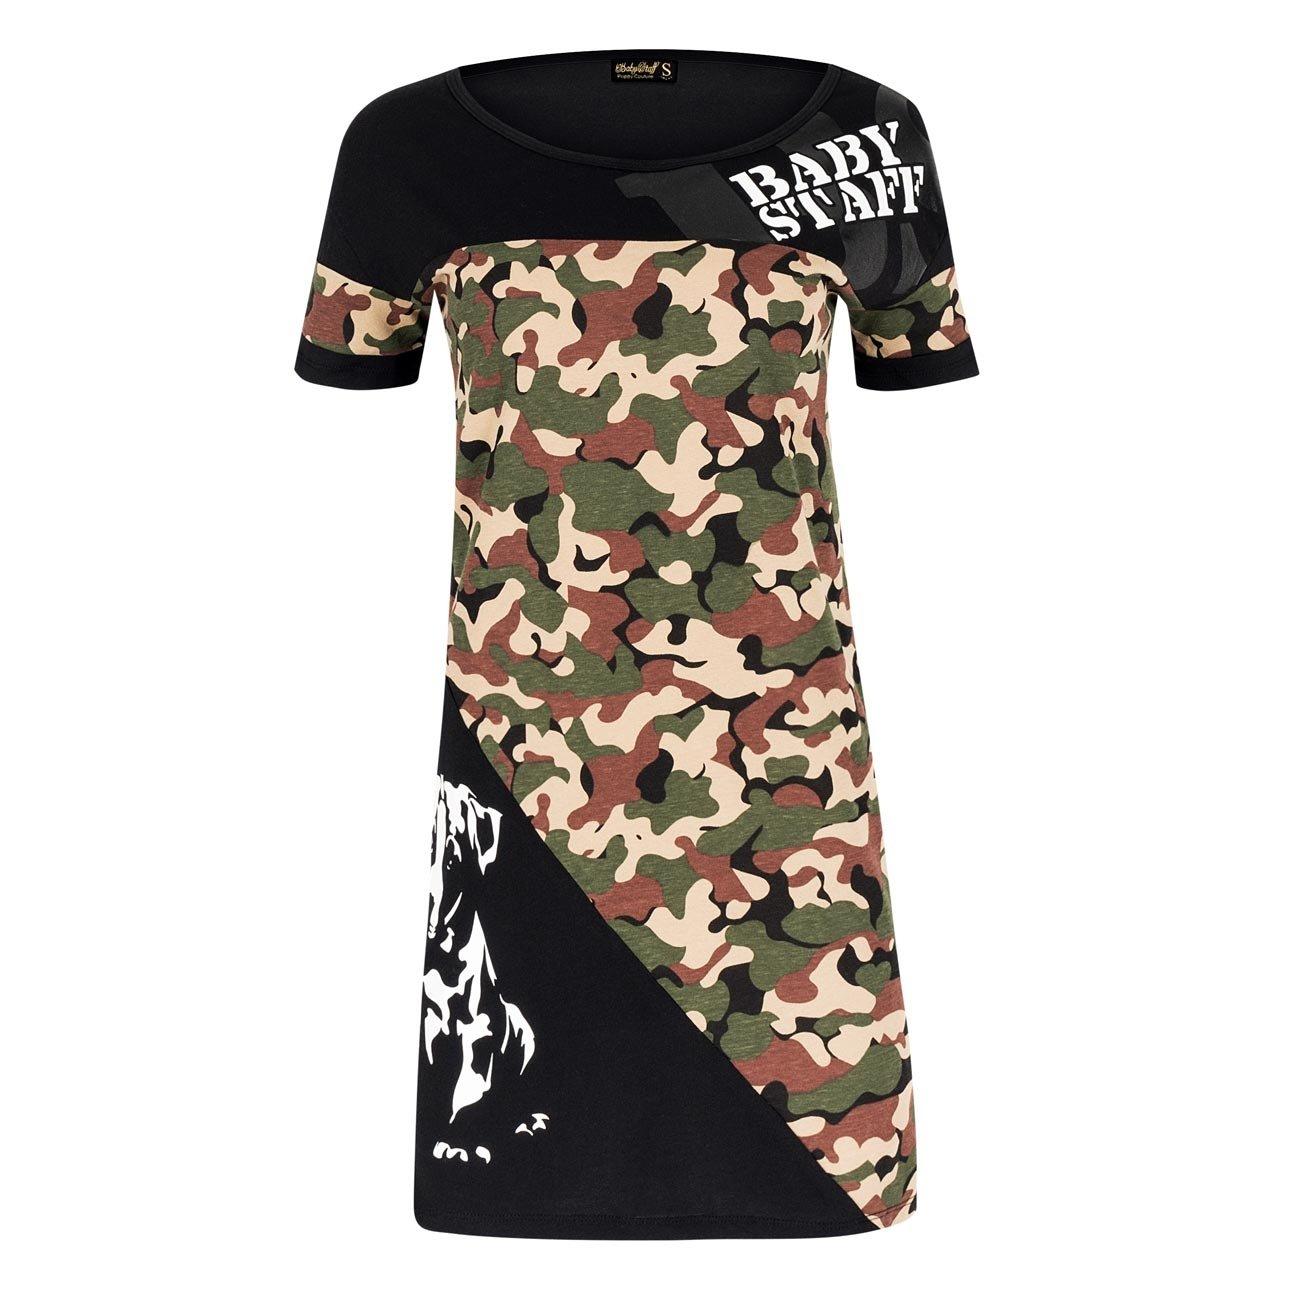 Babystaff Womens T-Shirt Tama